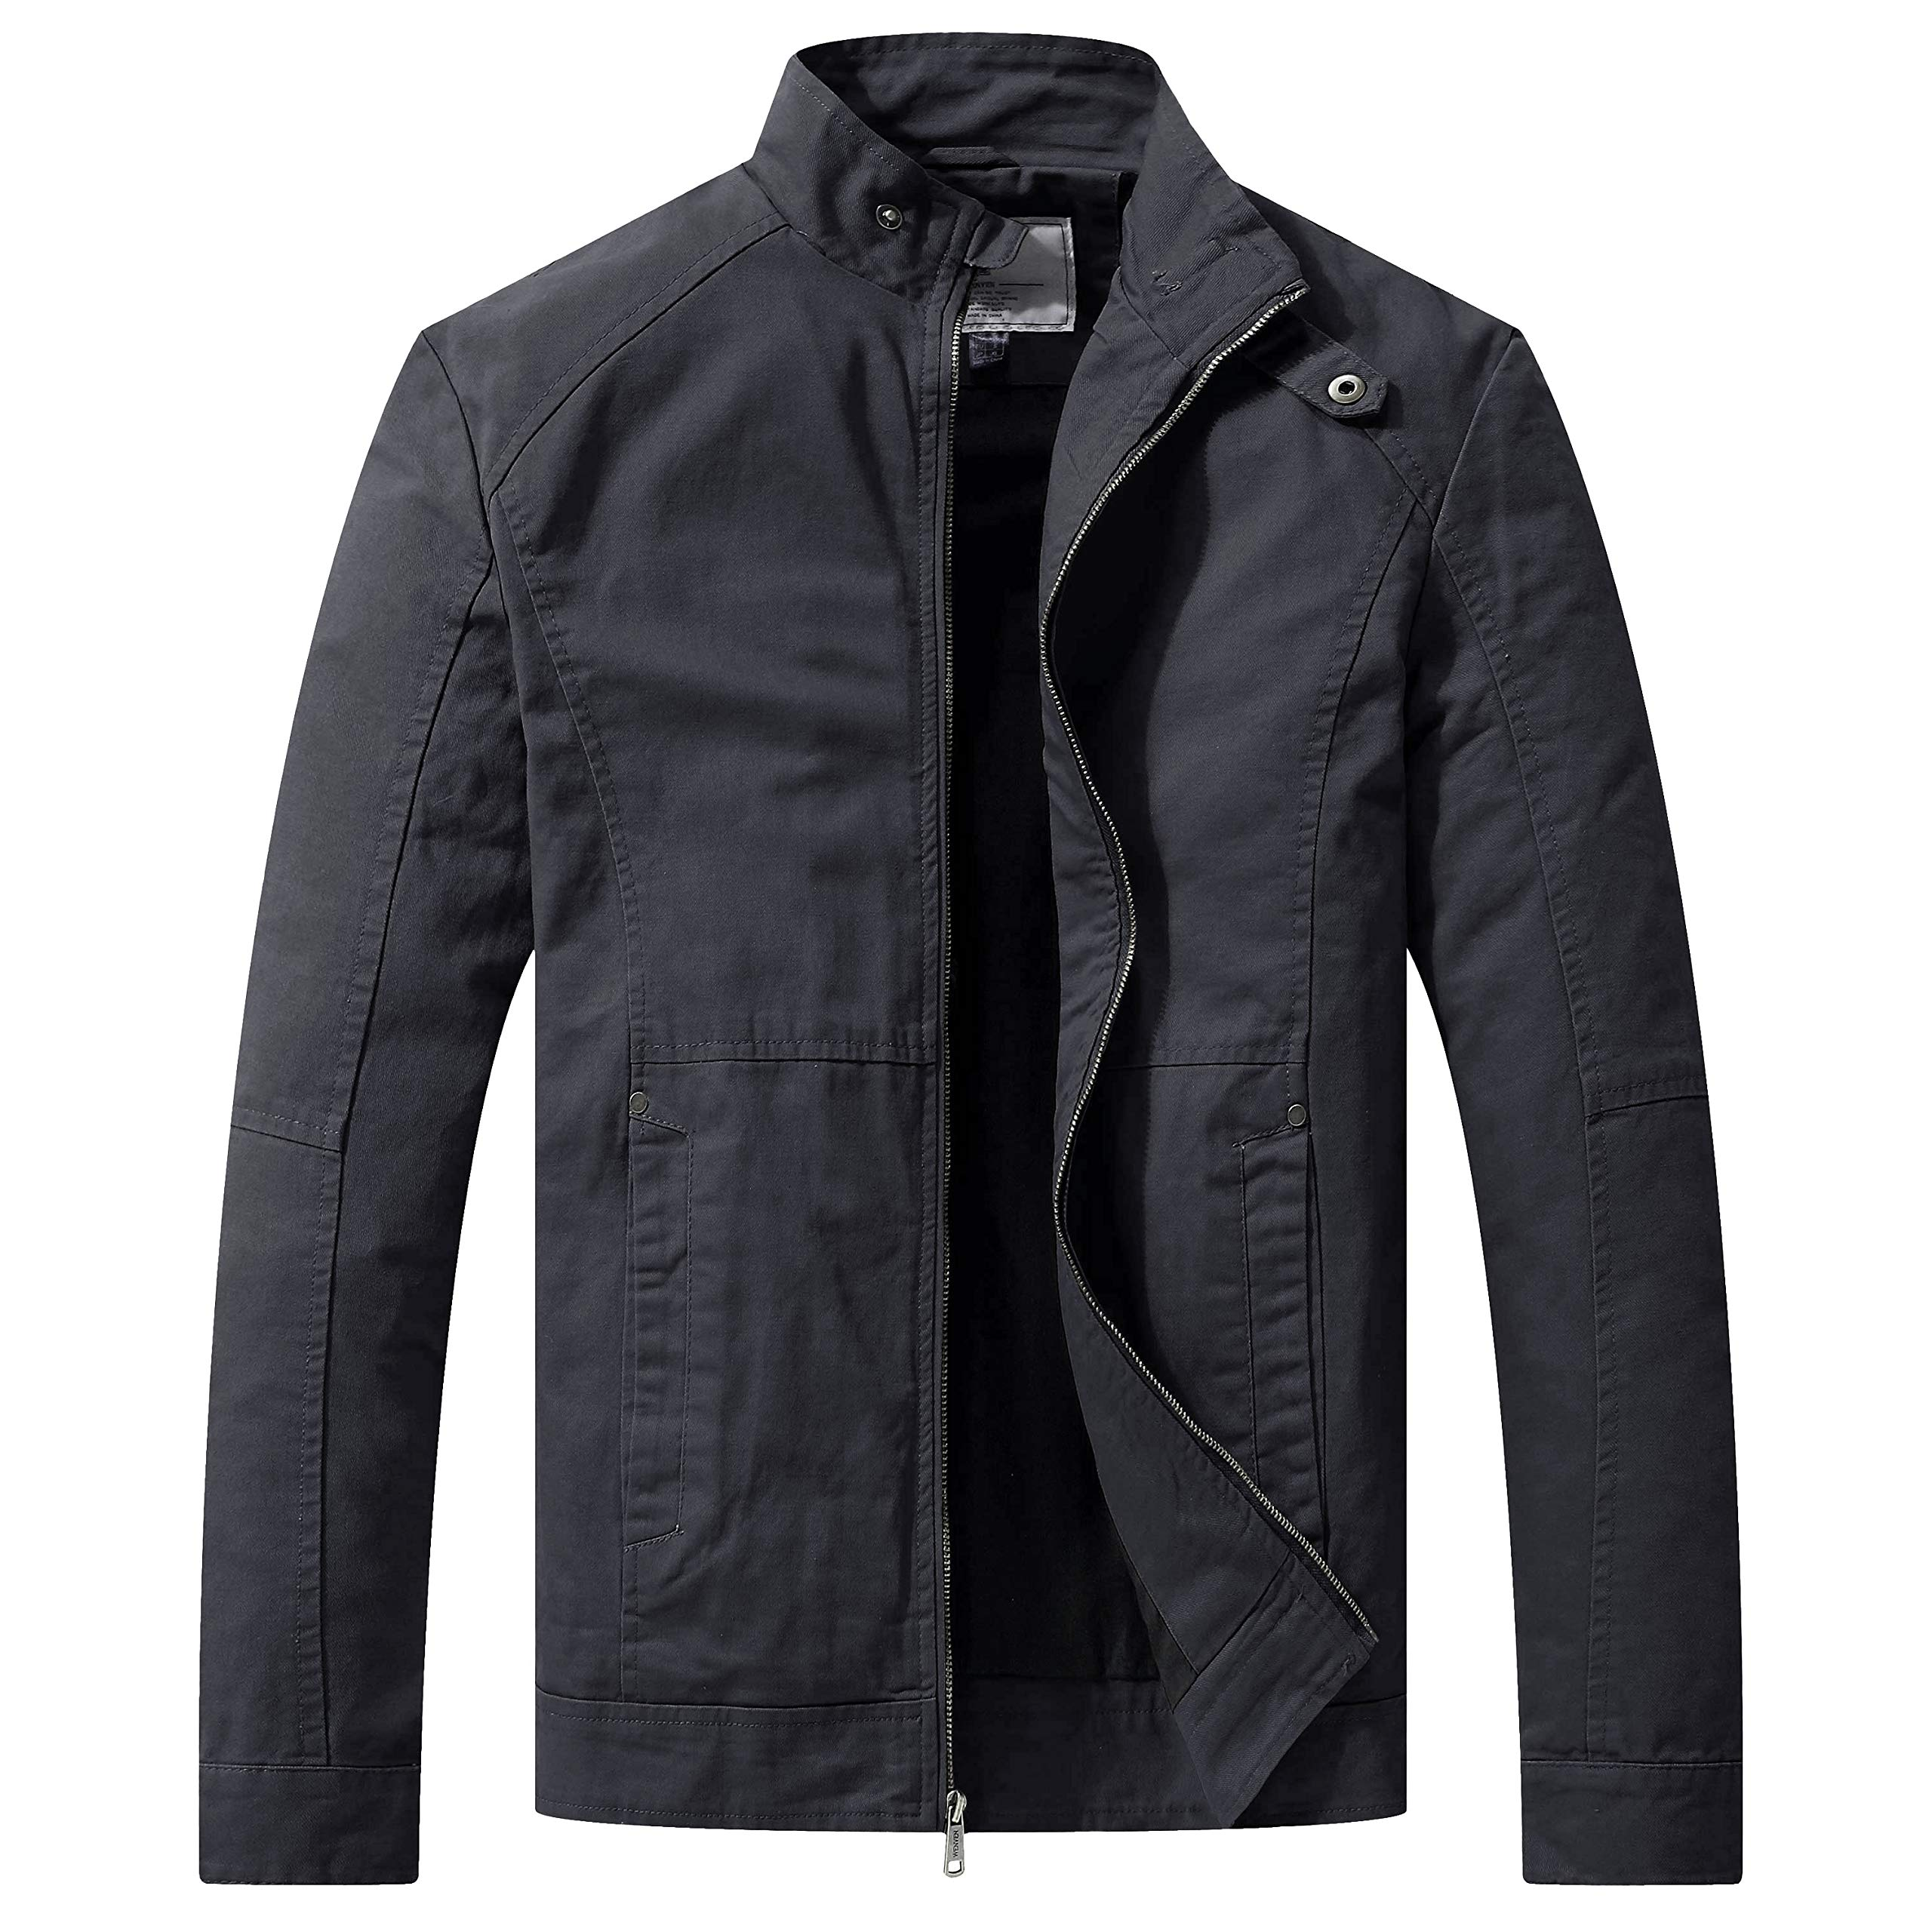 WenVen Men's Warm Casual Full Zip Military Jacket(Gray,M)